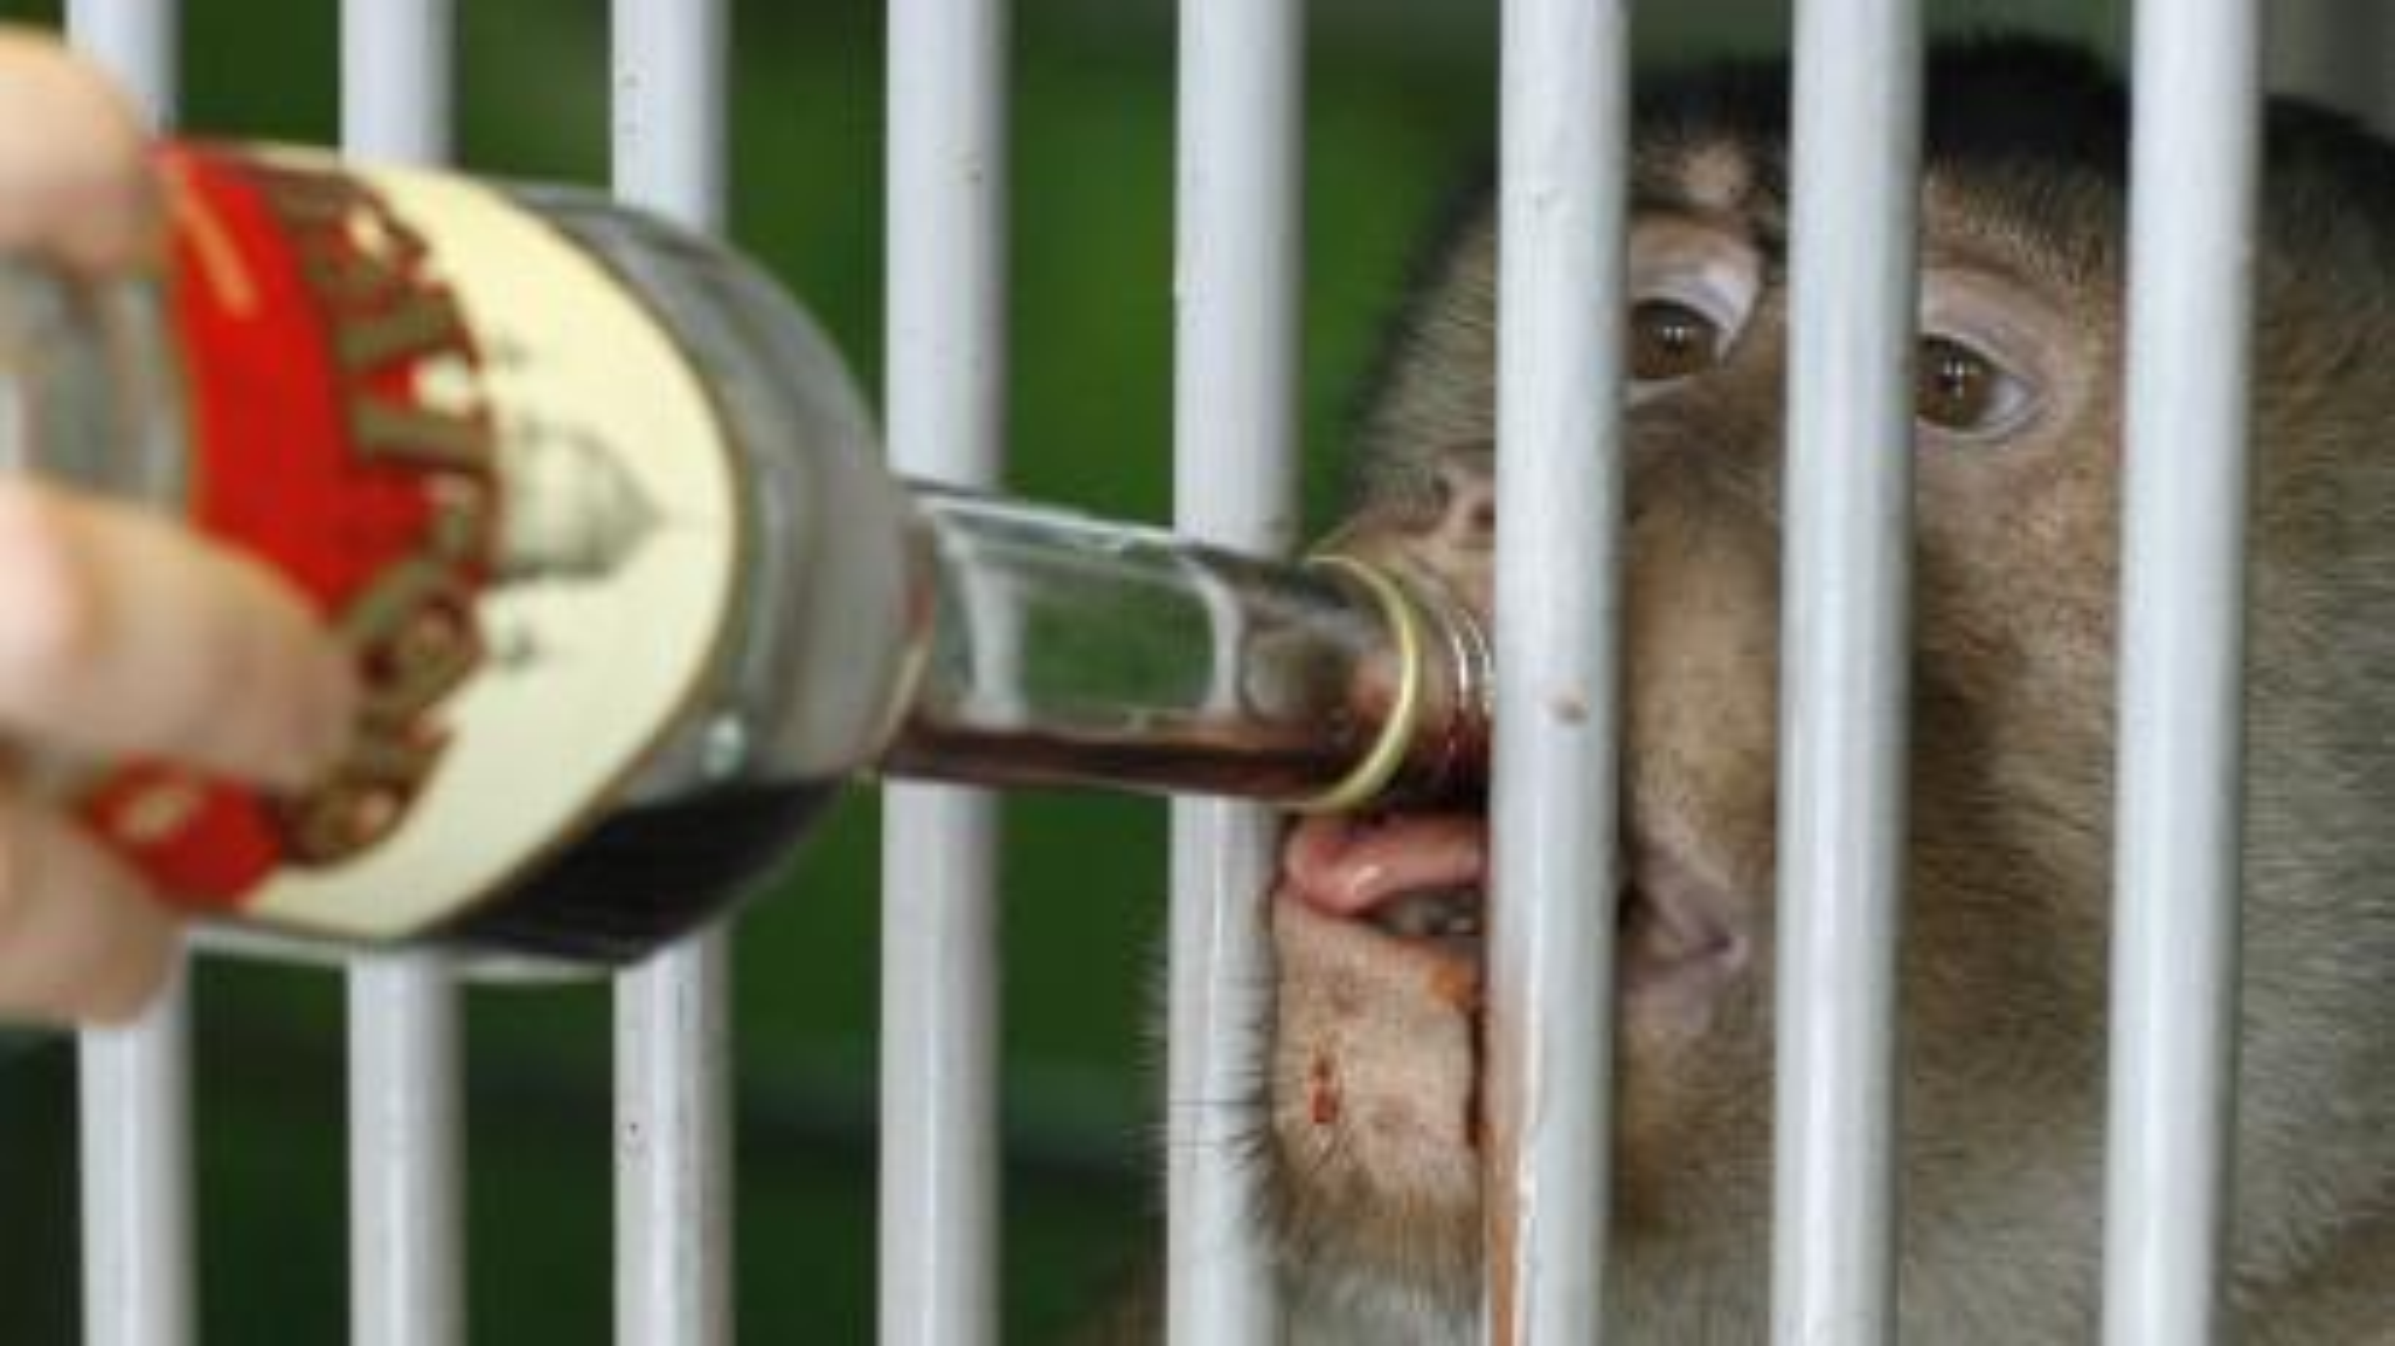 Monkey drinking wine